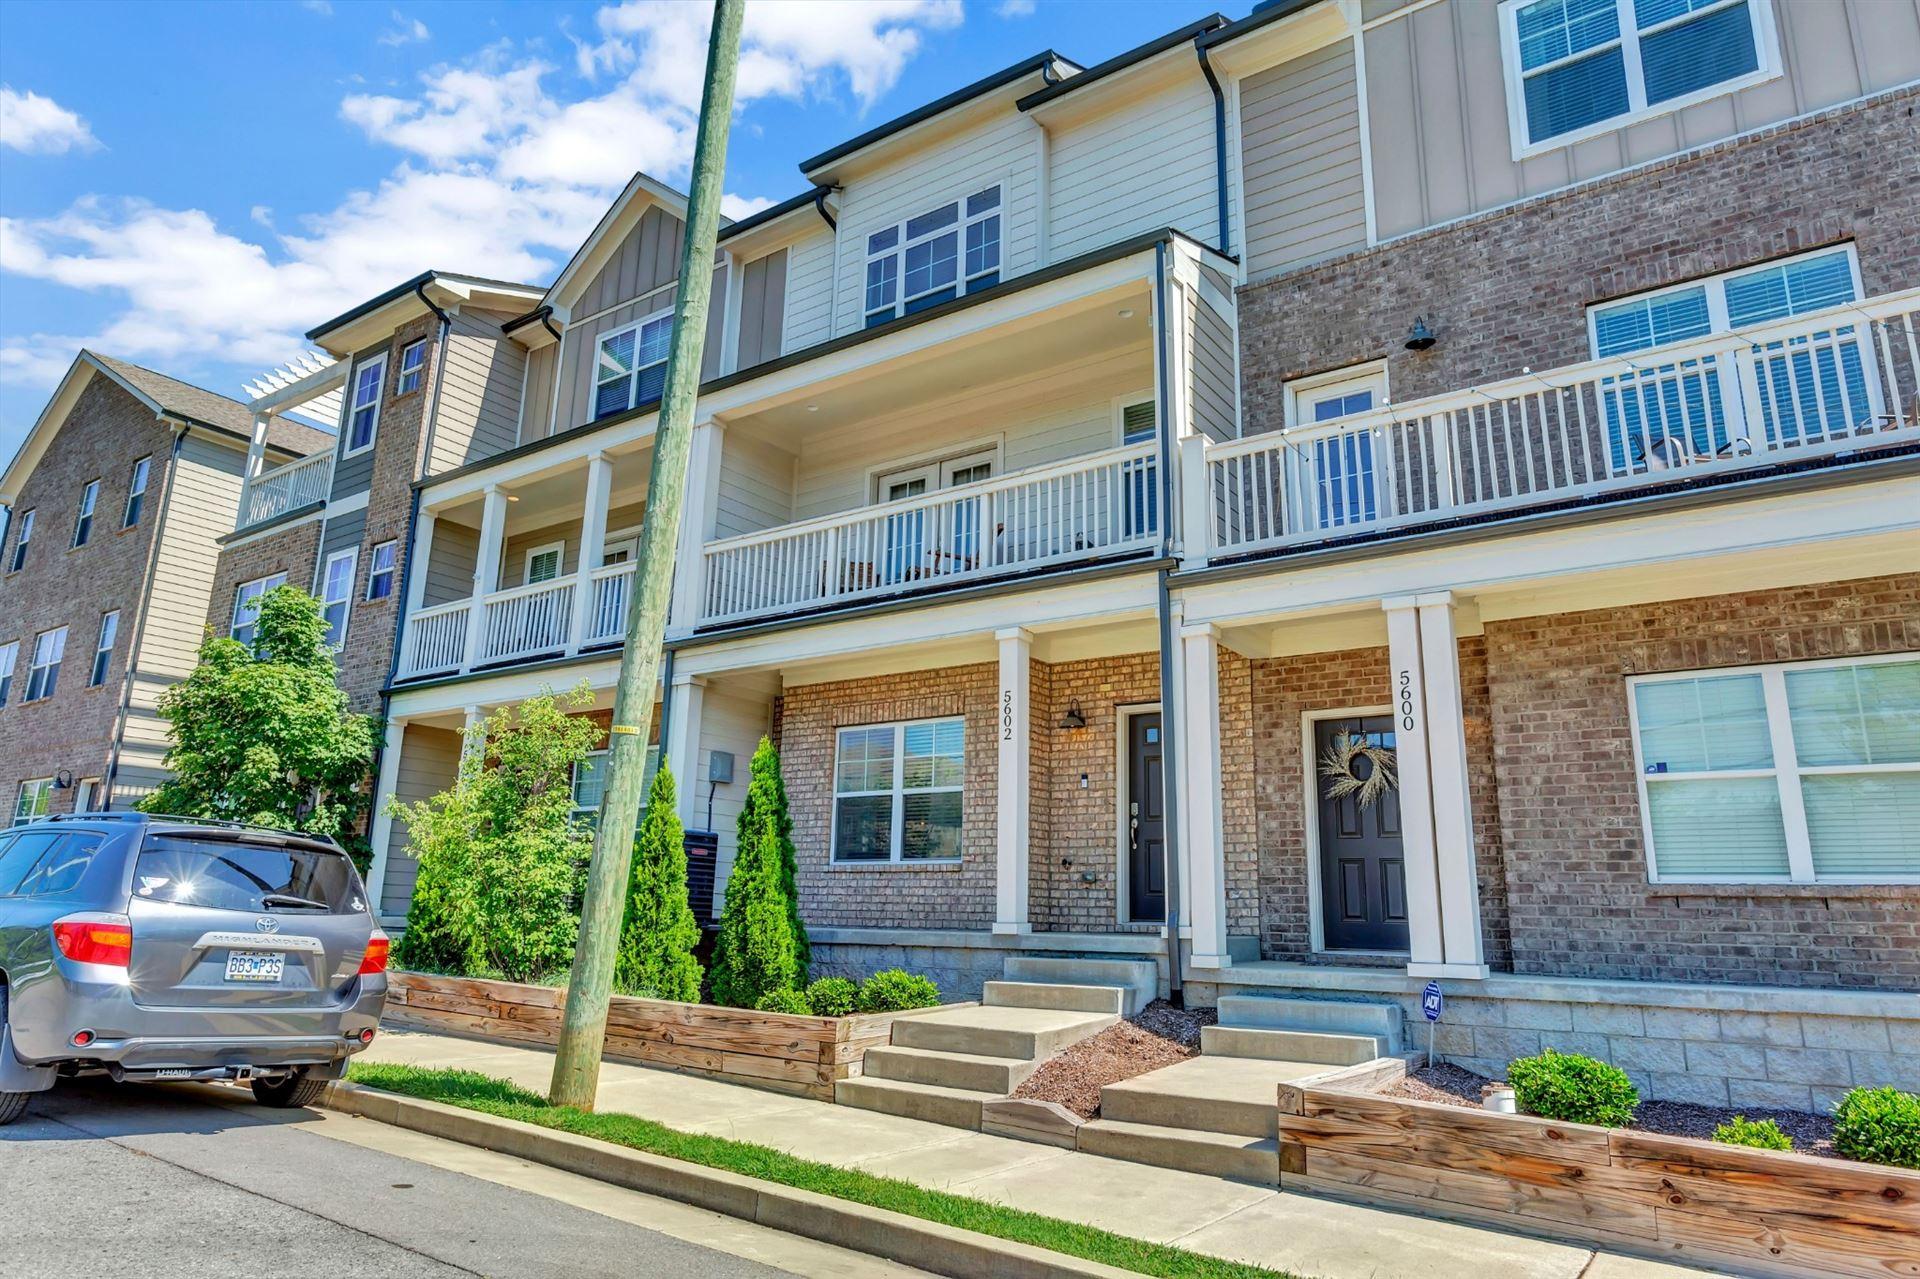 Photo of 5602 Morrow Rd, Nashville, TN 37209 (MLS # 2190559)